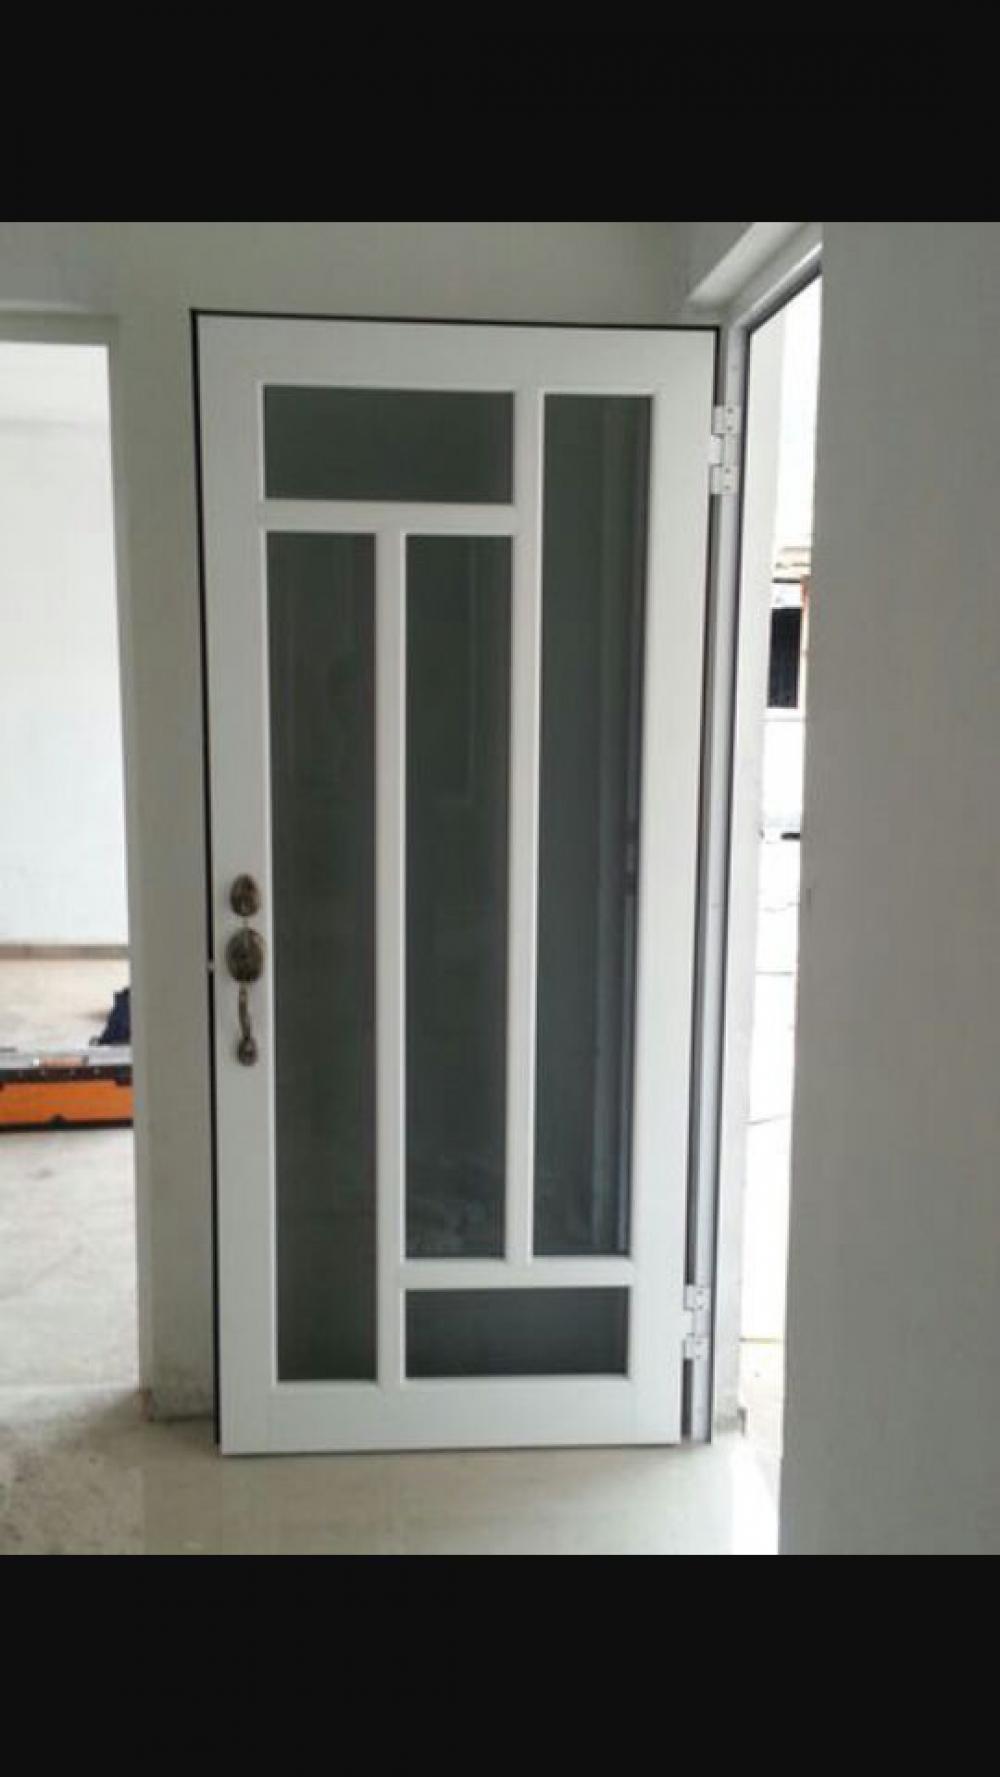 Puertas de pvc baratas good ventanas de aluminio baratas for Puertas de exterior baratas